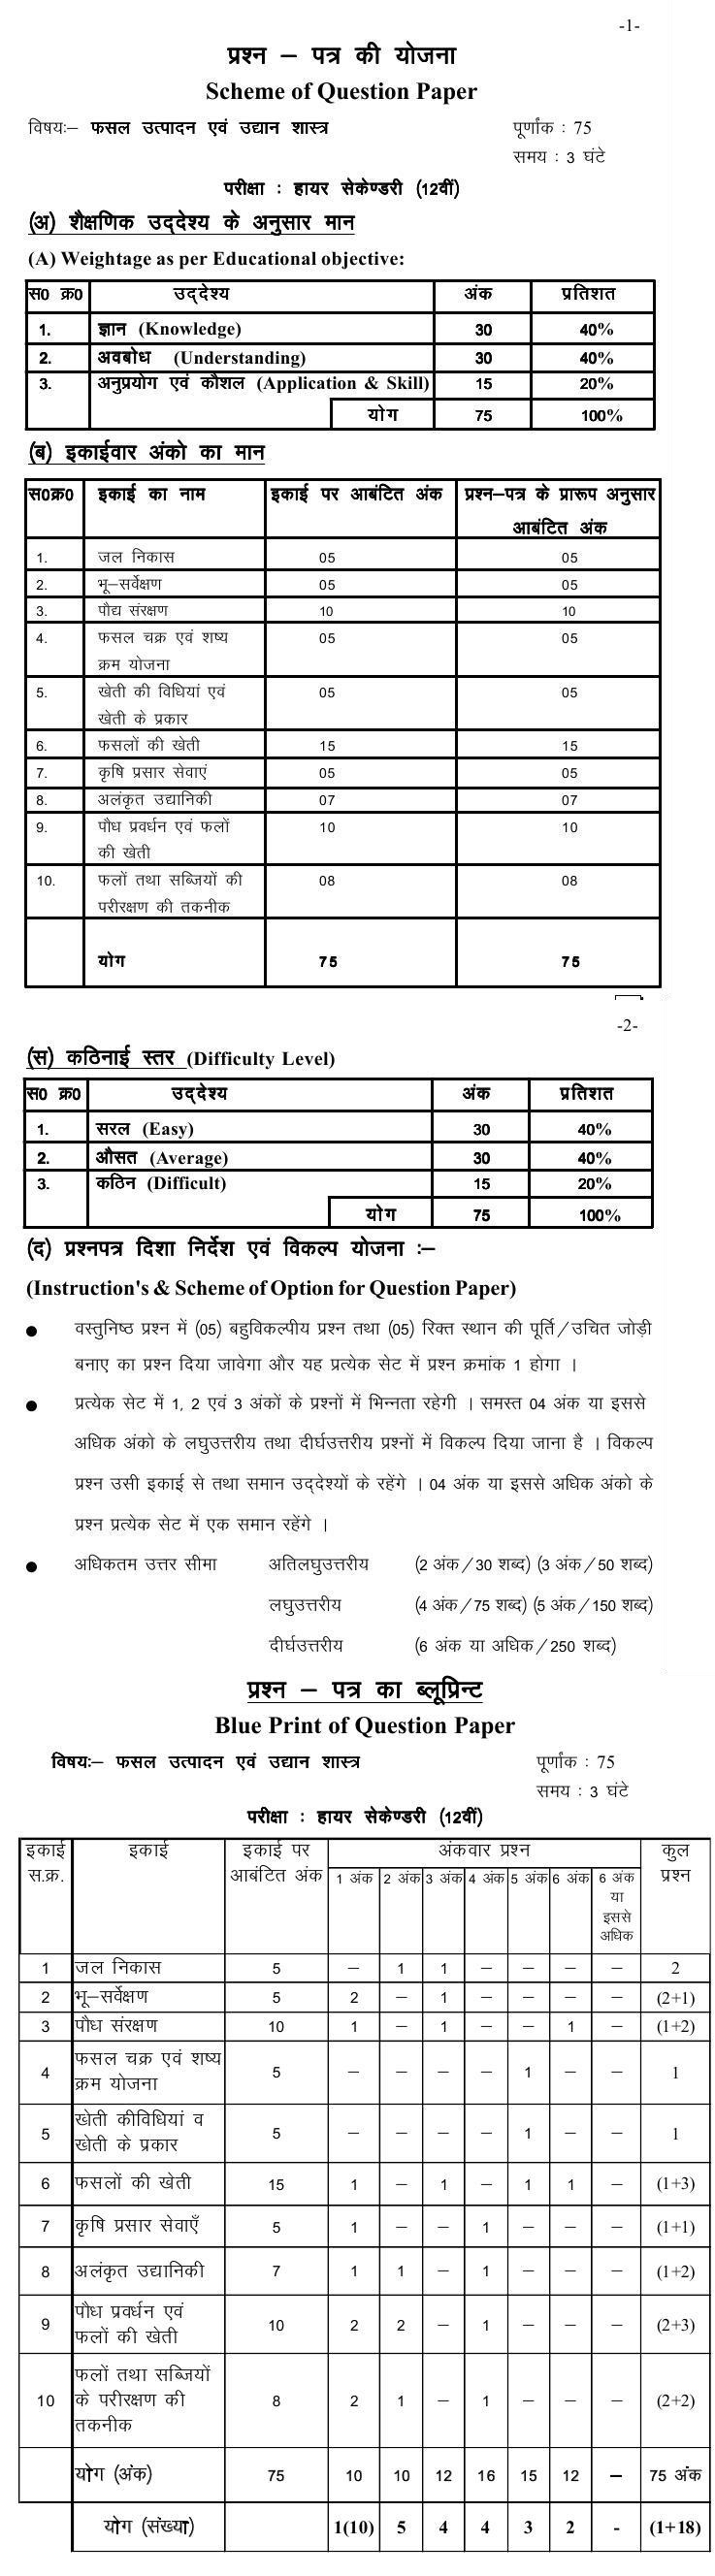 Chattisgarh Board Class 12 Scheme and Blue Print of Agriculture and Farming science (Fasal utpadan evam Udyan shastra)